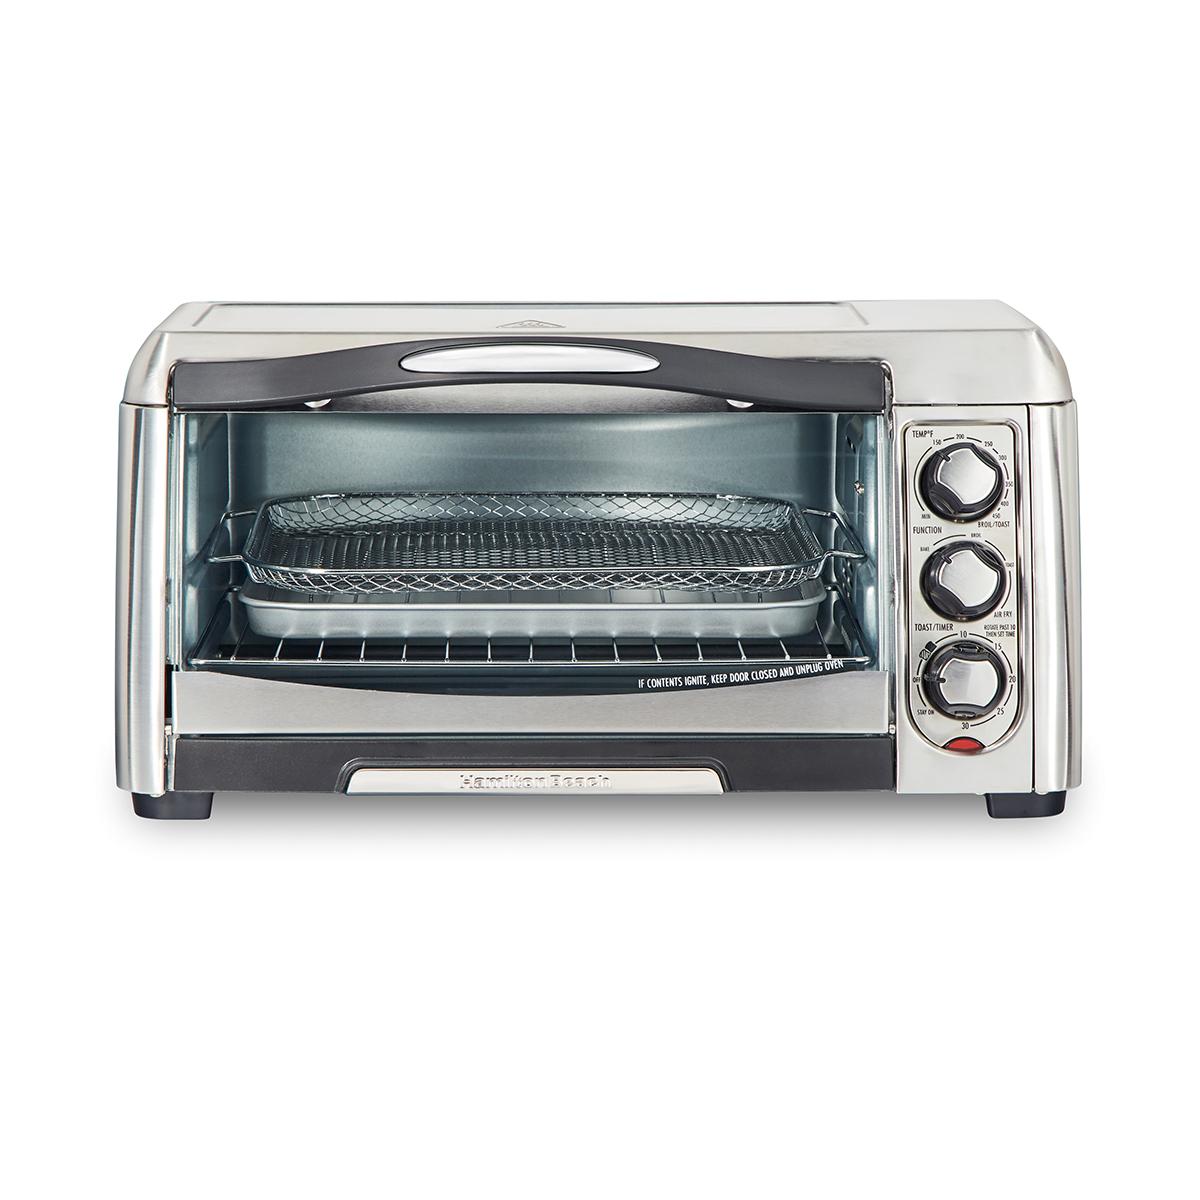 hamilton beach sure crisp air fry toaster oven 31323